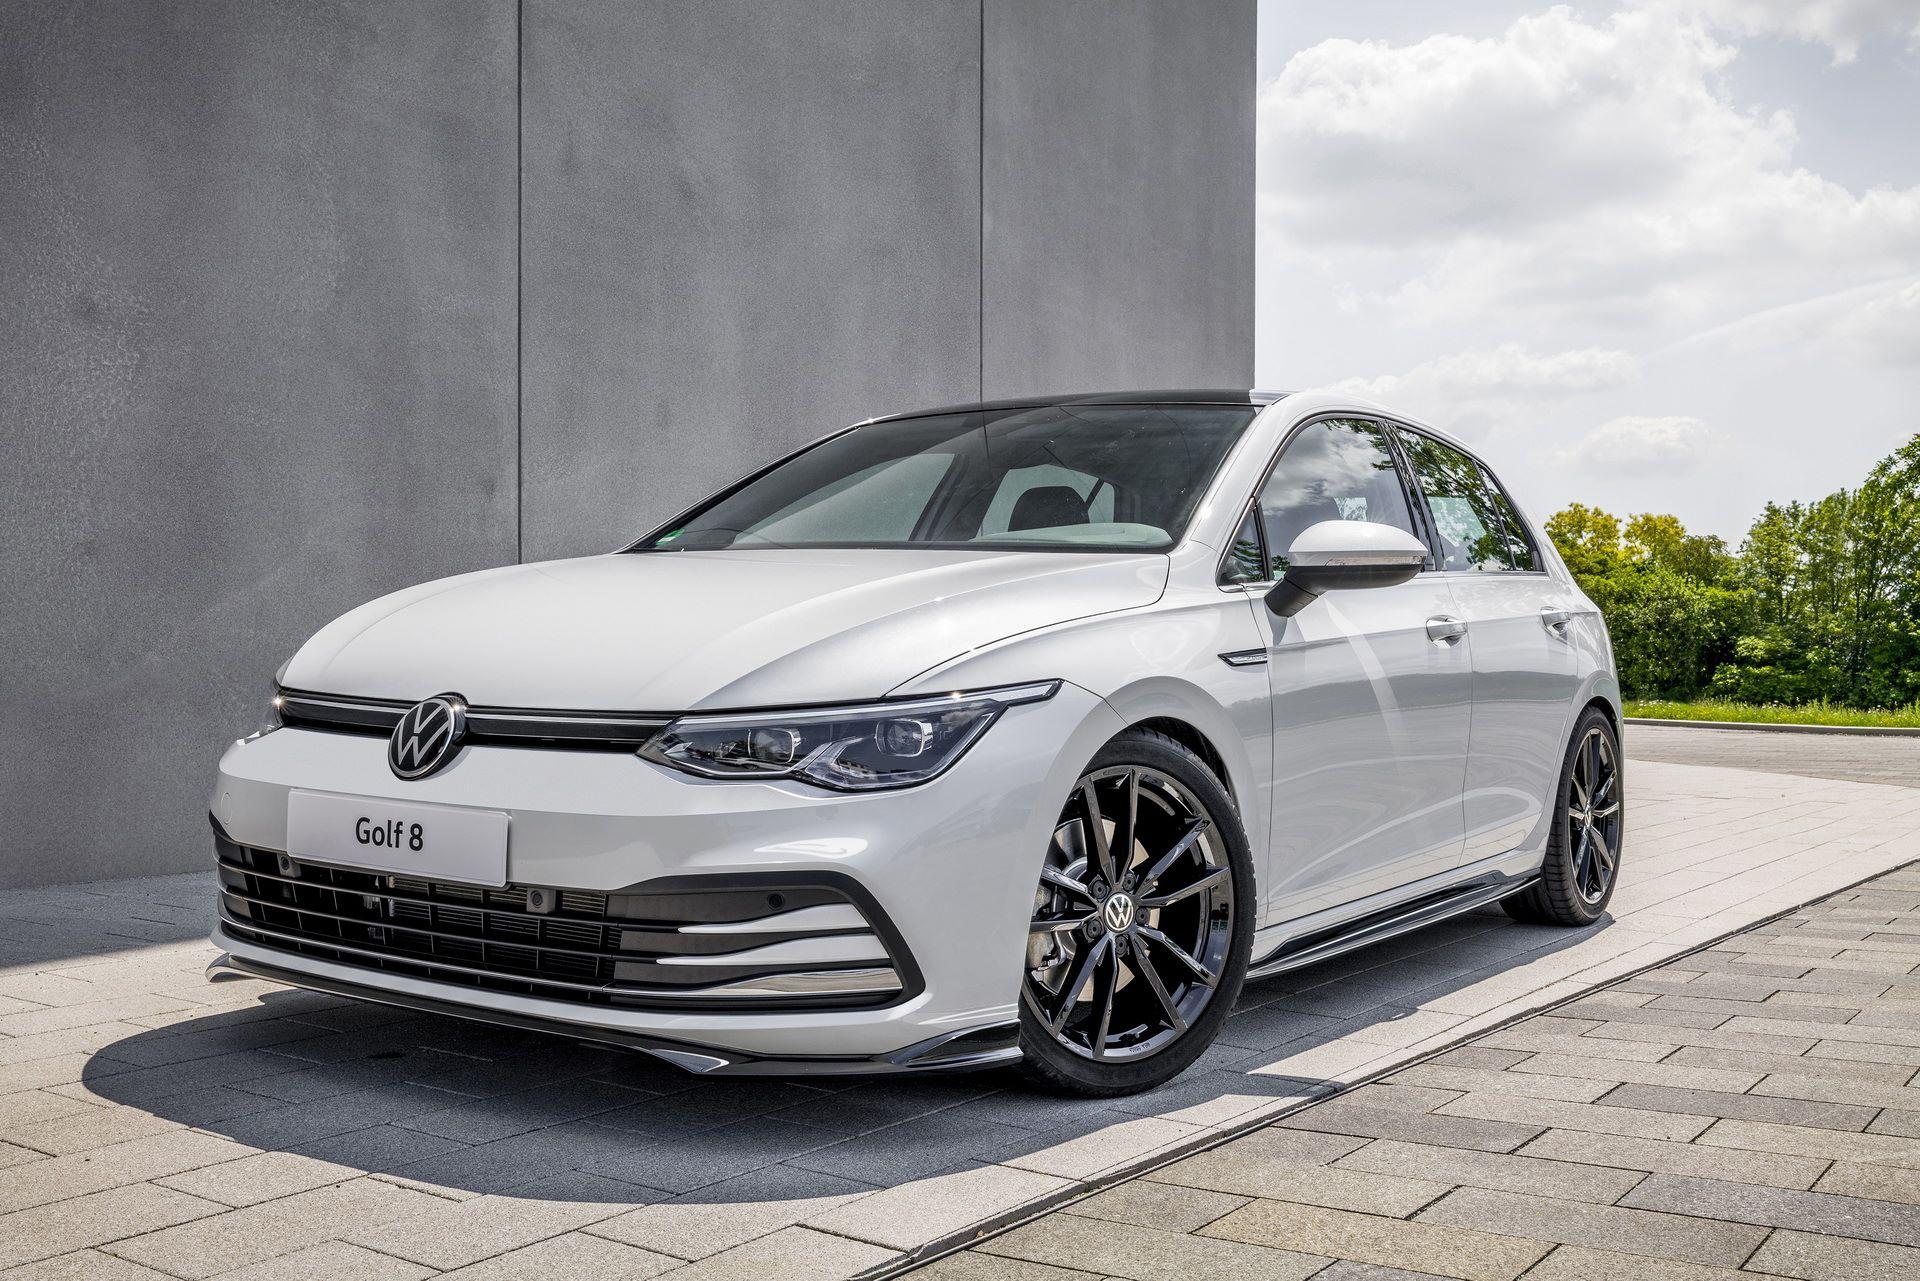 Volkswagen-Golf-8-by-Oettinger-5